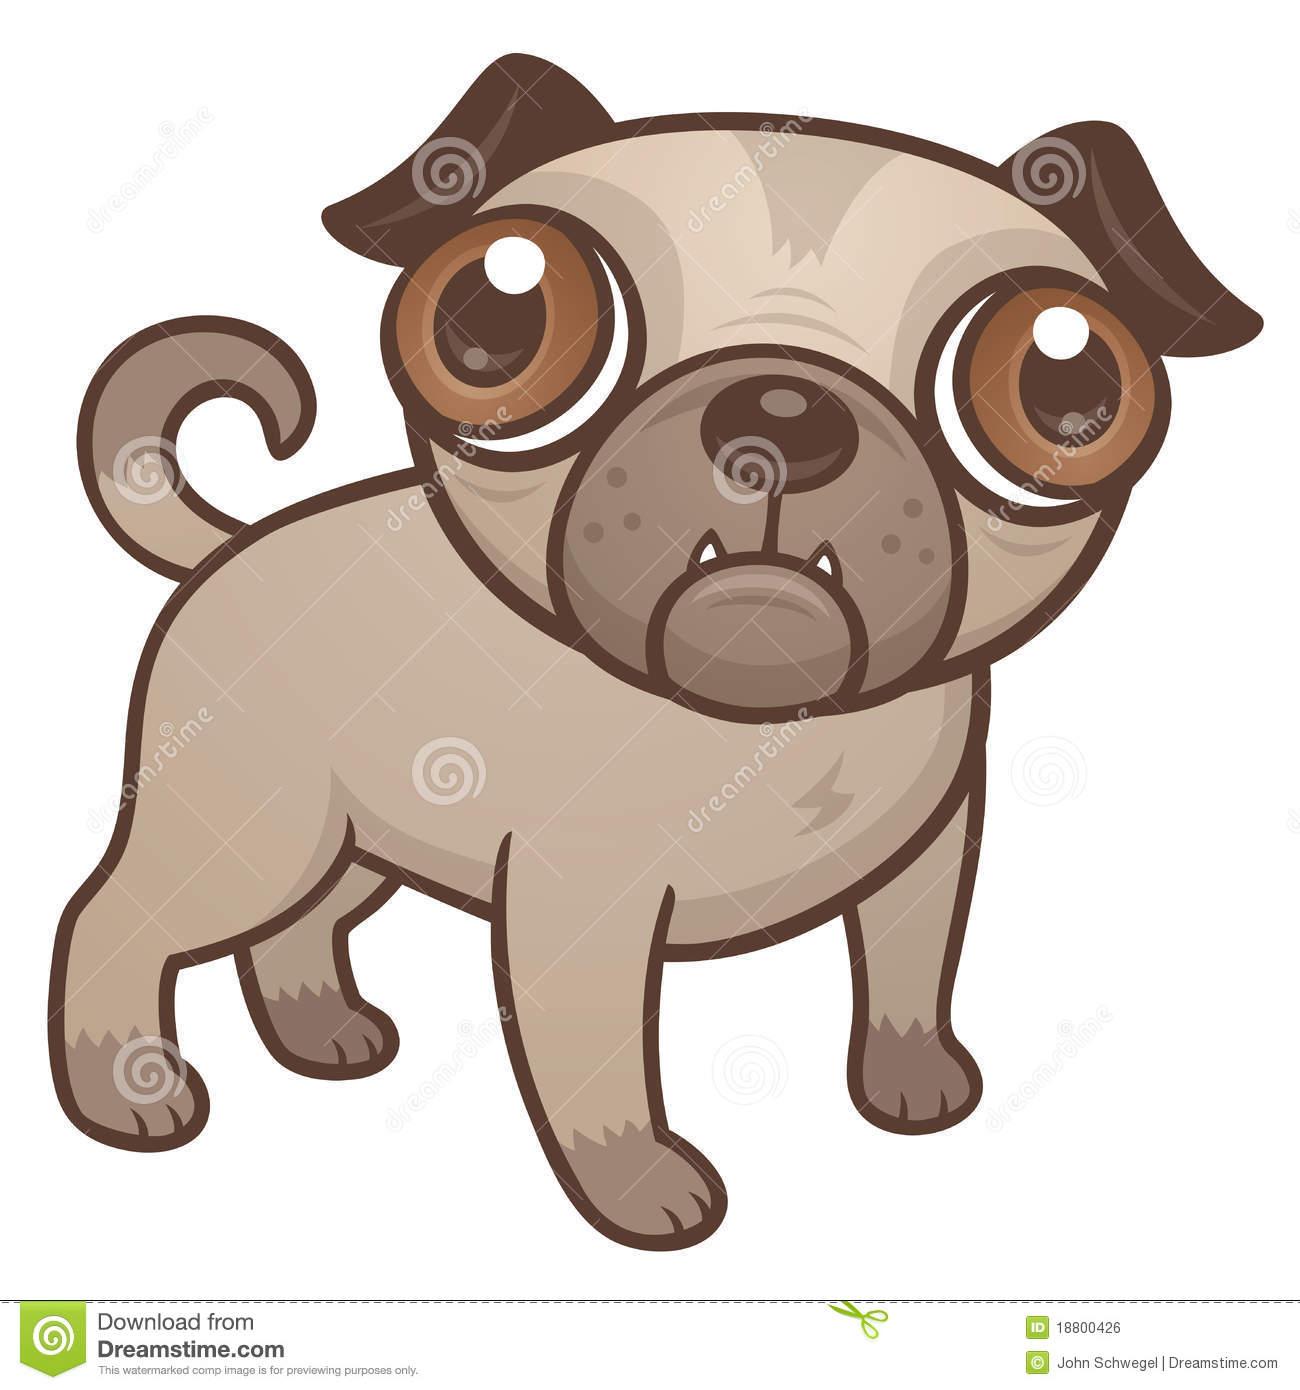 Pug Puppy Cartoon Royalty Free Stock Image